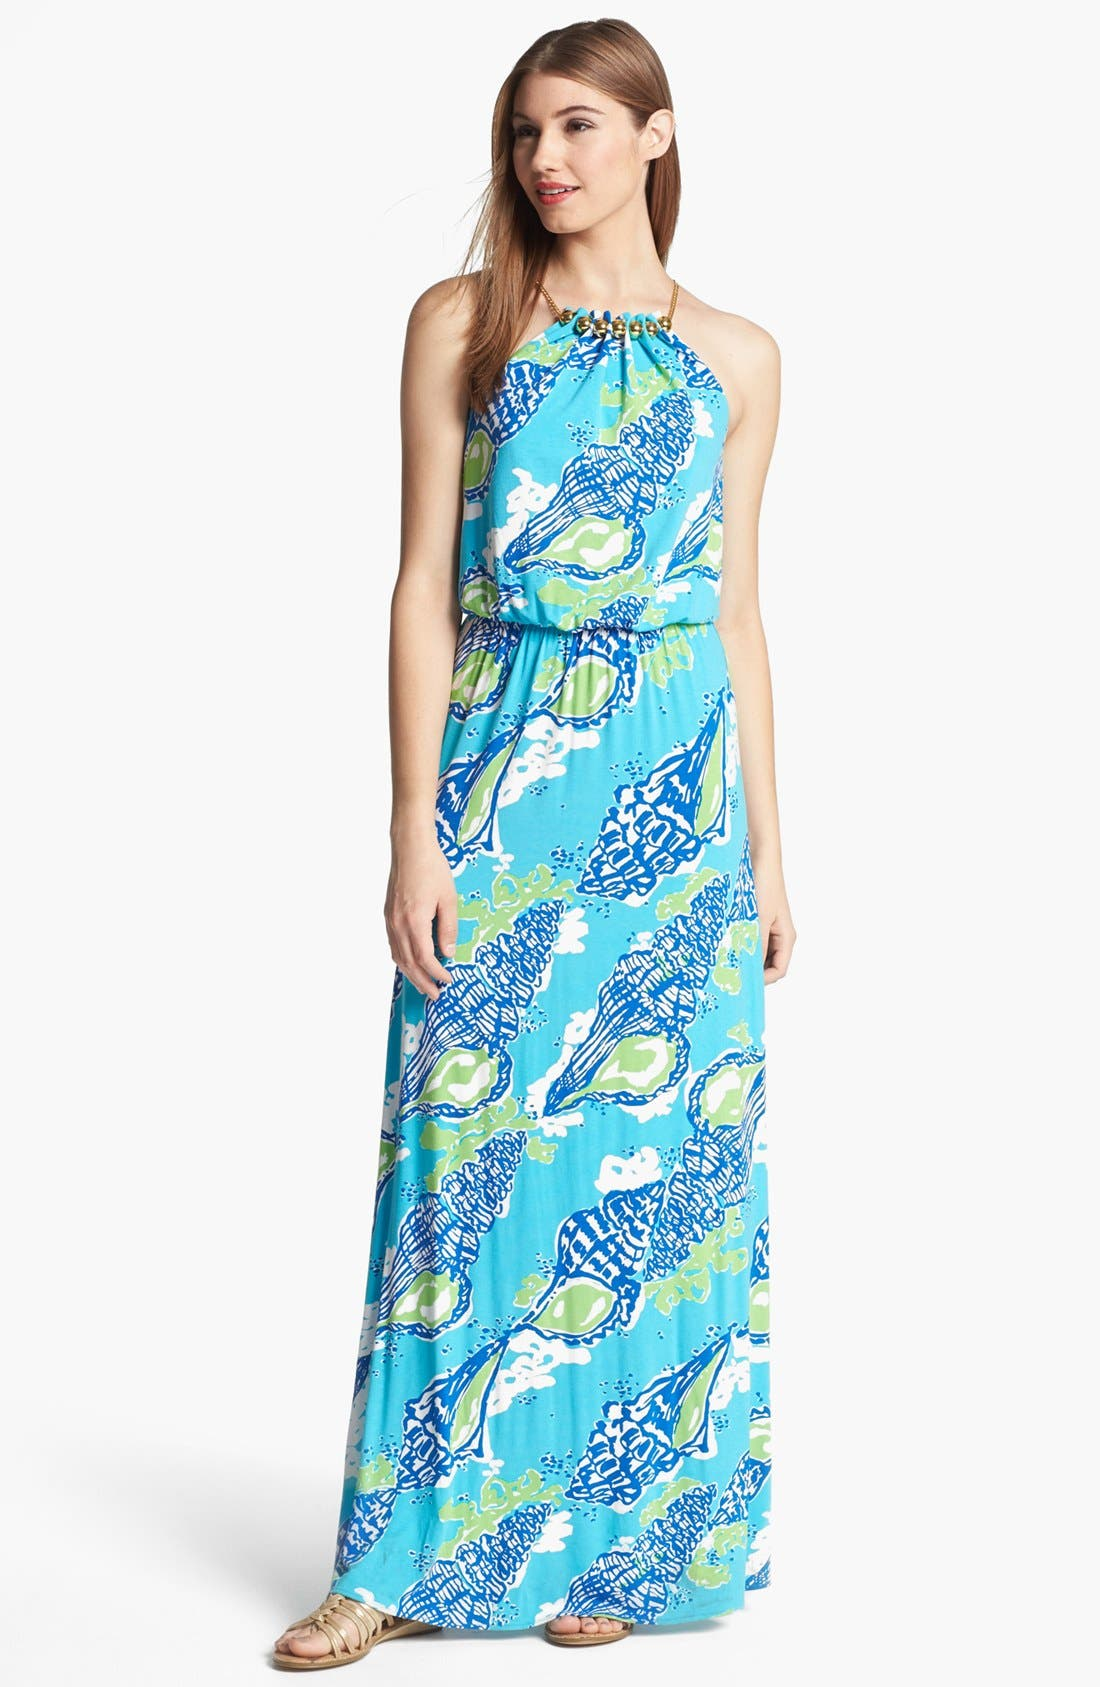 Main Image - Lilly Pulitzer® 'Inna' Maxi Dress